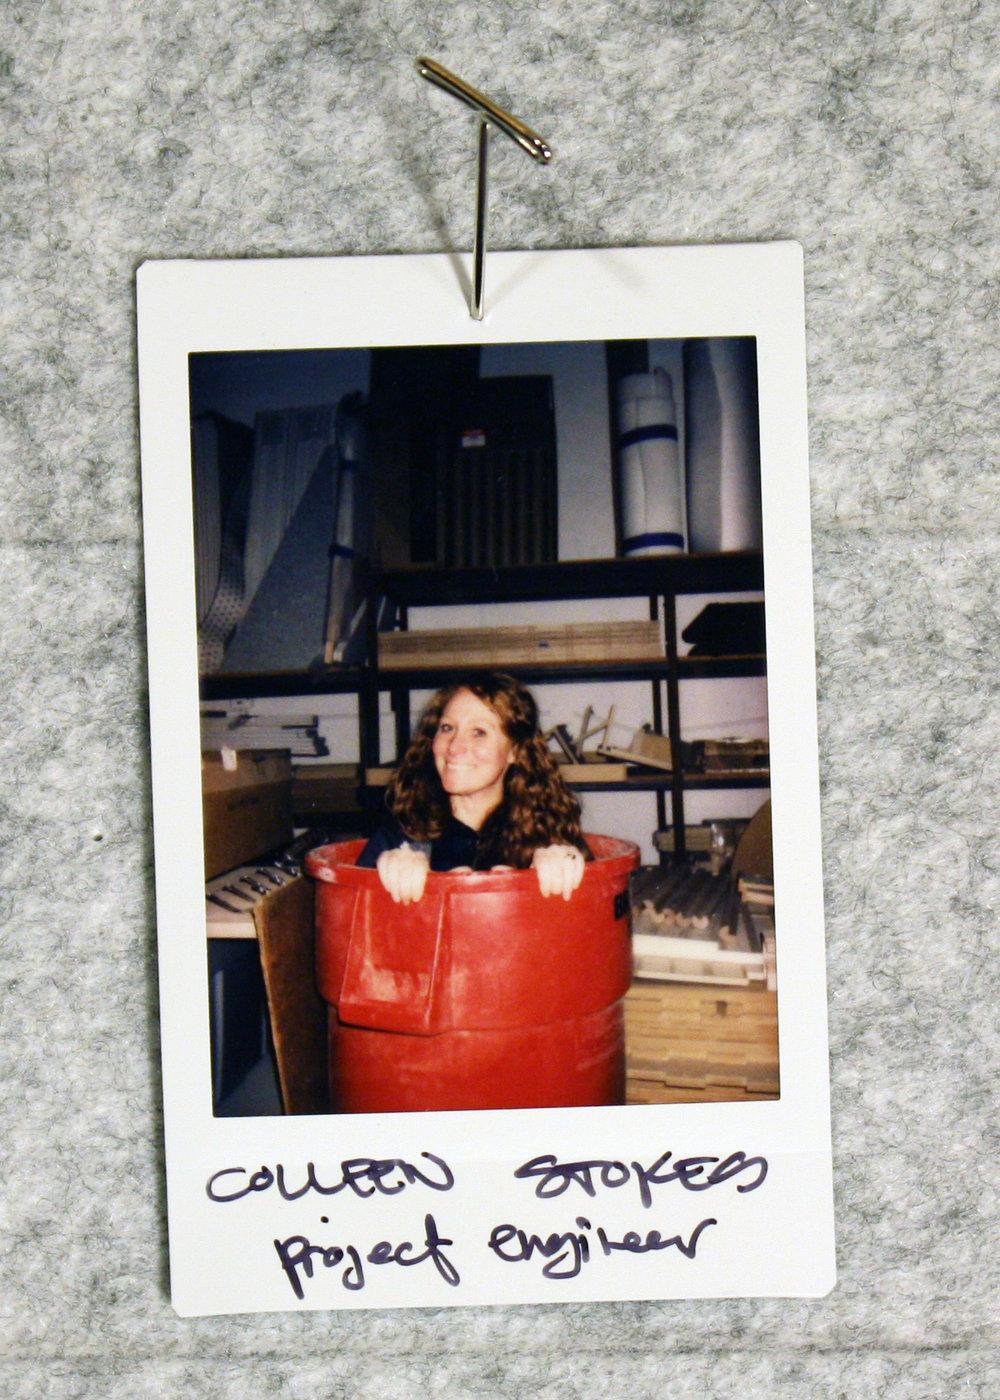 Colleen Stokes